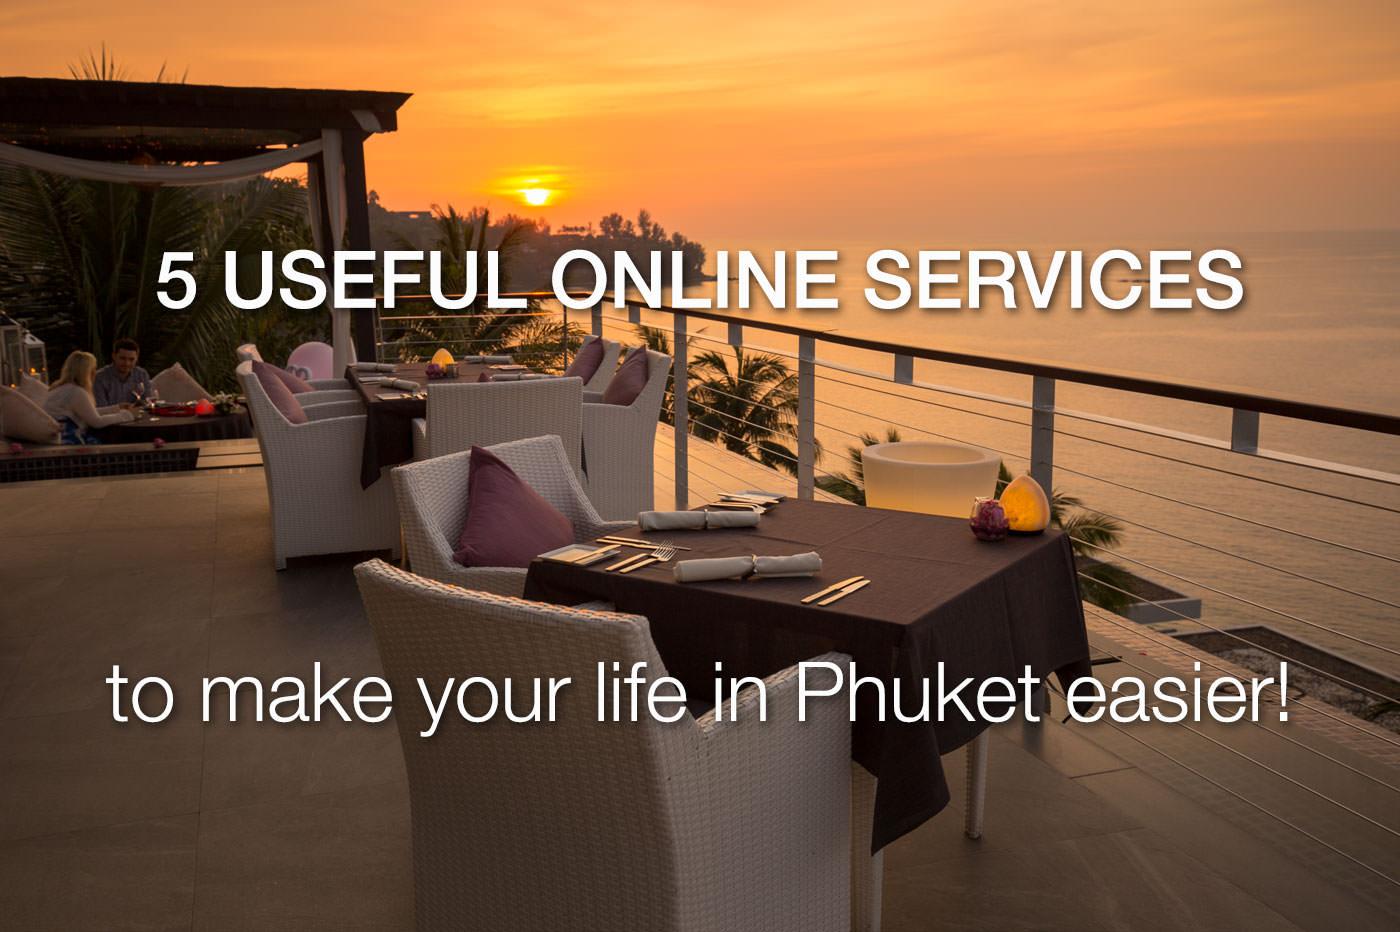 Phuket Online Services